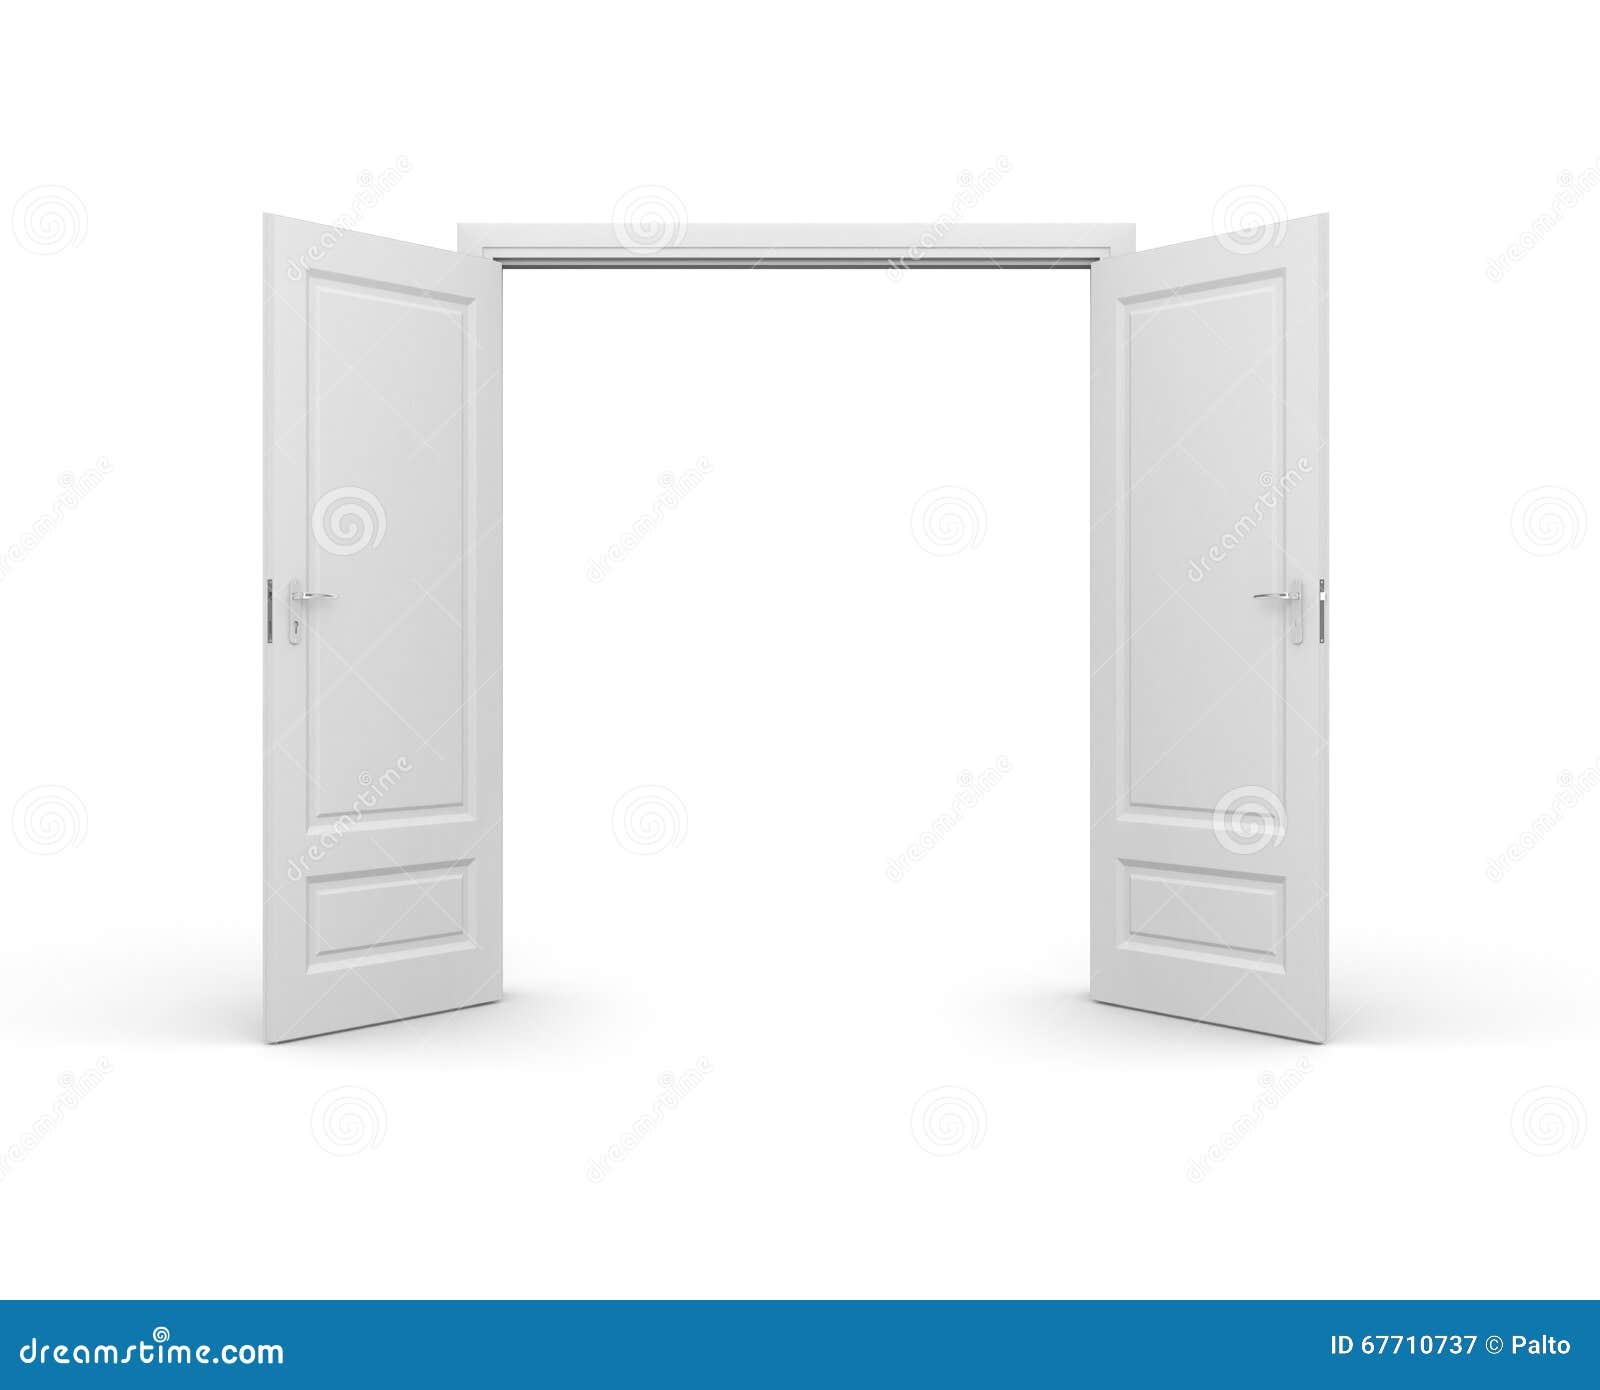 Geöffnete tür  Geöffnete Tür Stock Abbildung - Bild: 67710737